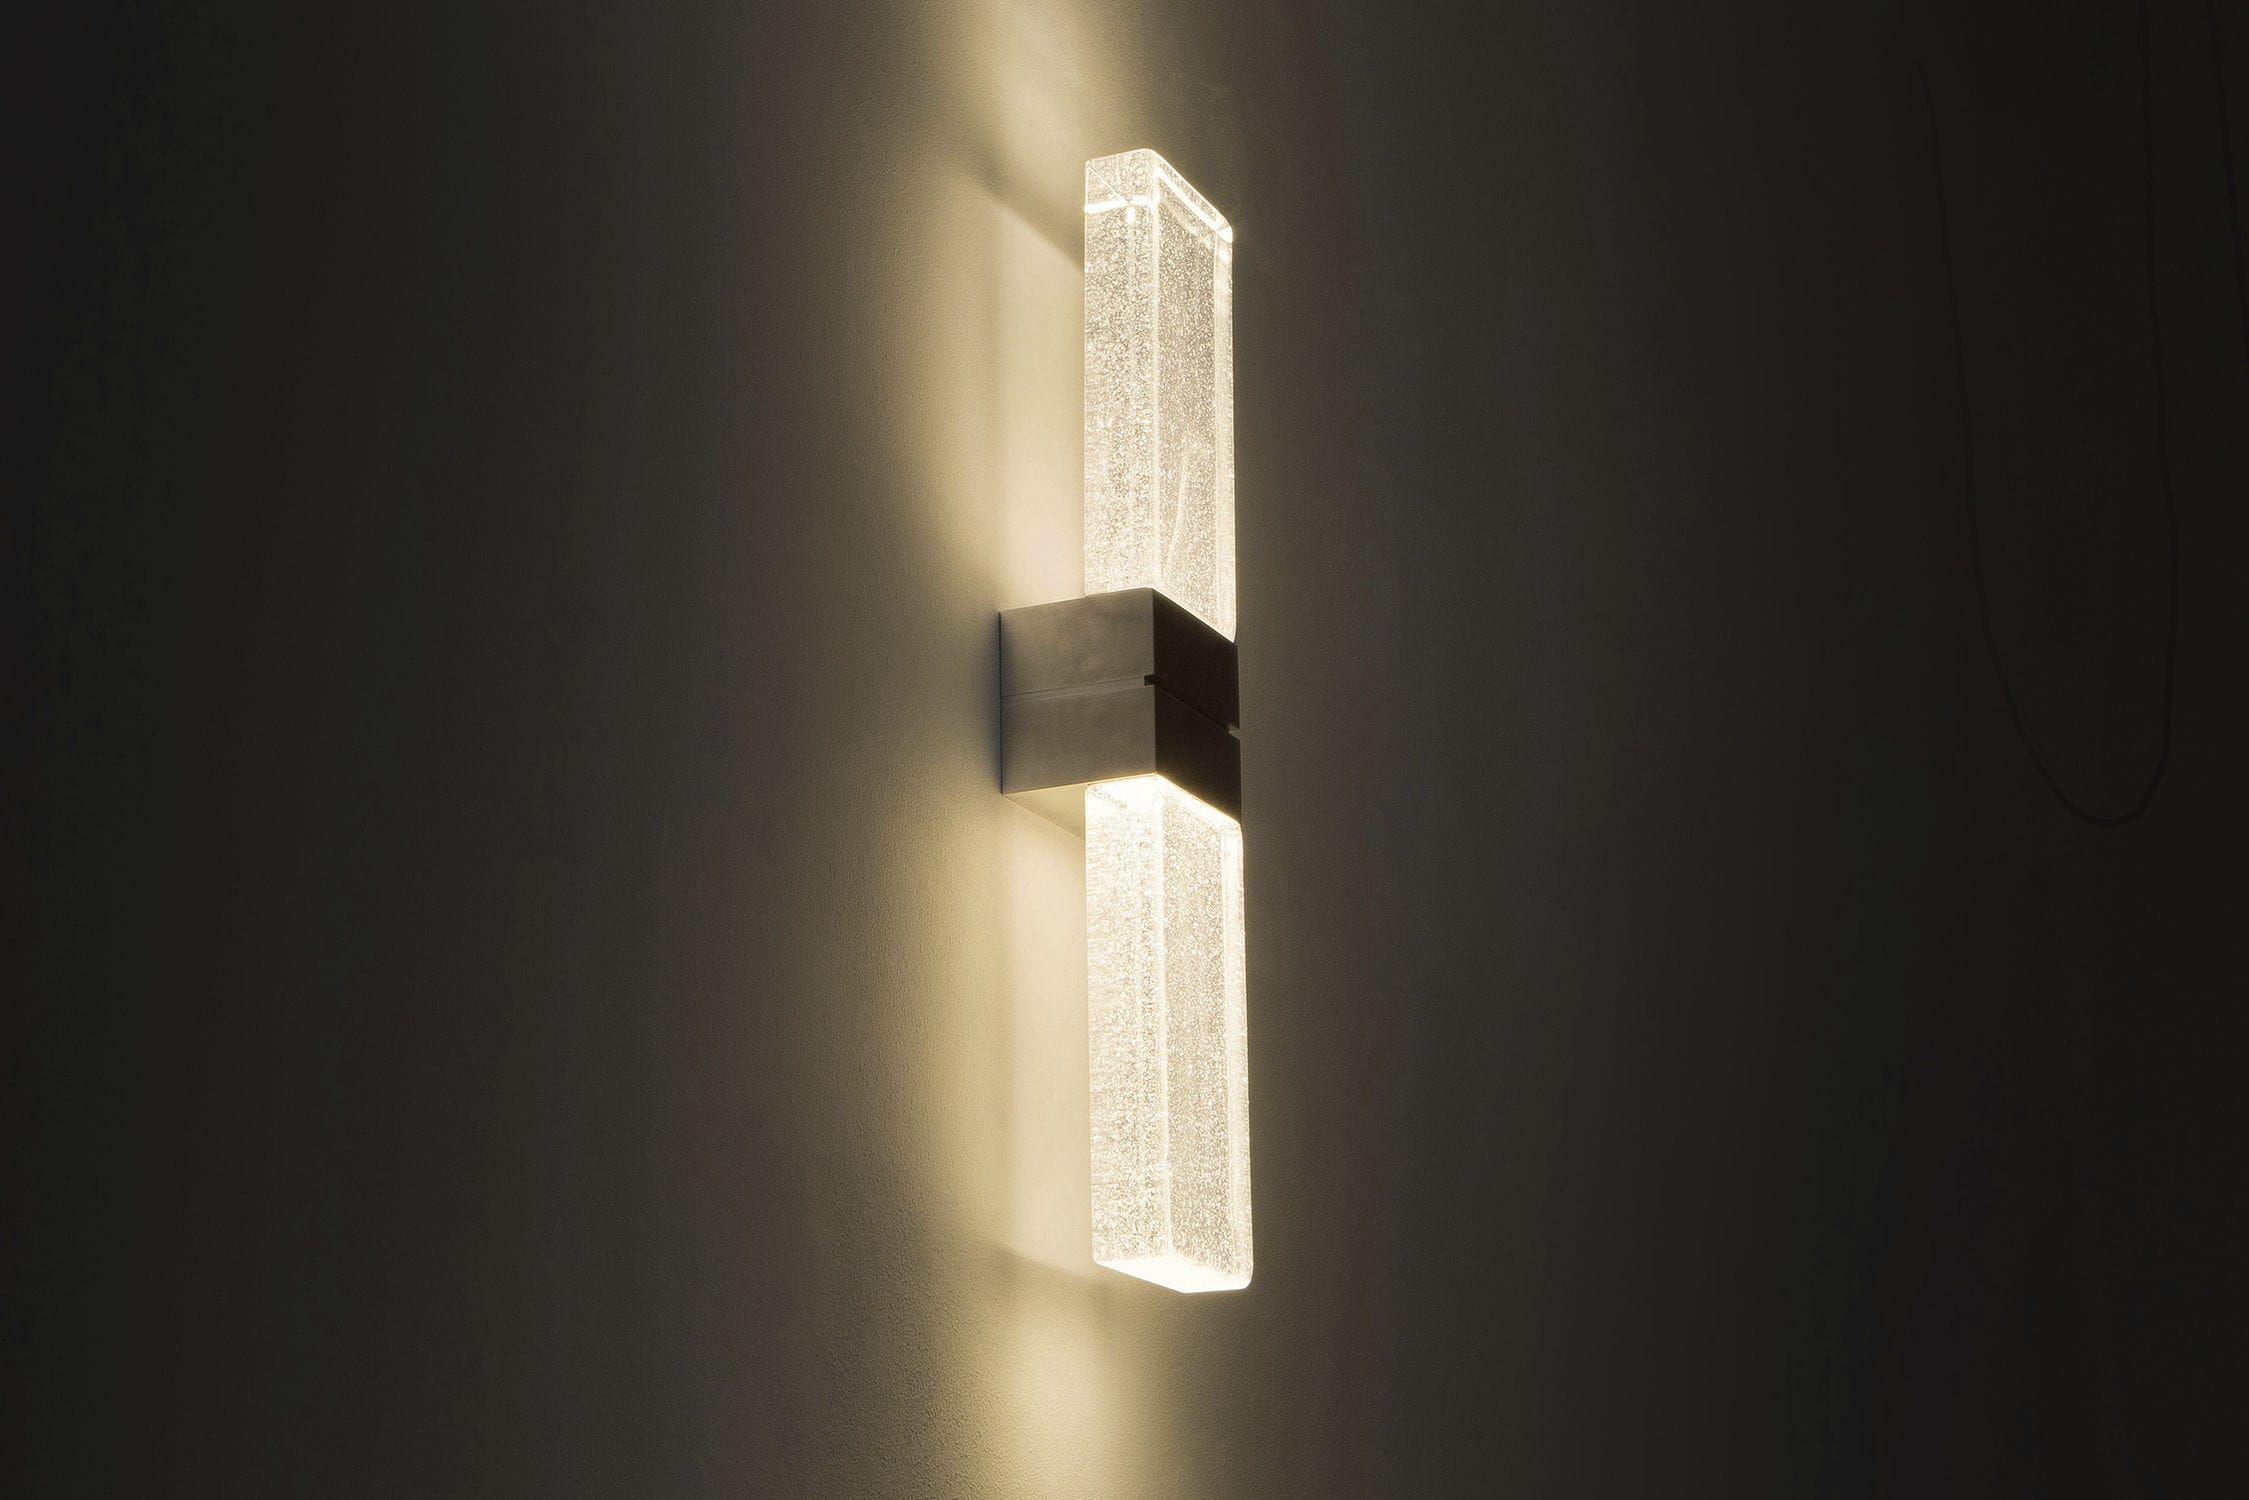 Contemporary Wall Light Glass Led Rectangular Grand Papillon Duo Massifcentral Wall Lights Contemporary Wall Lights Contemporary Wall